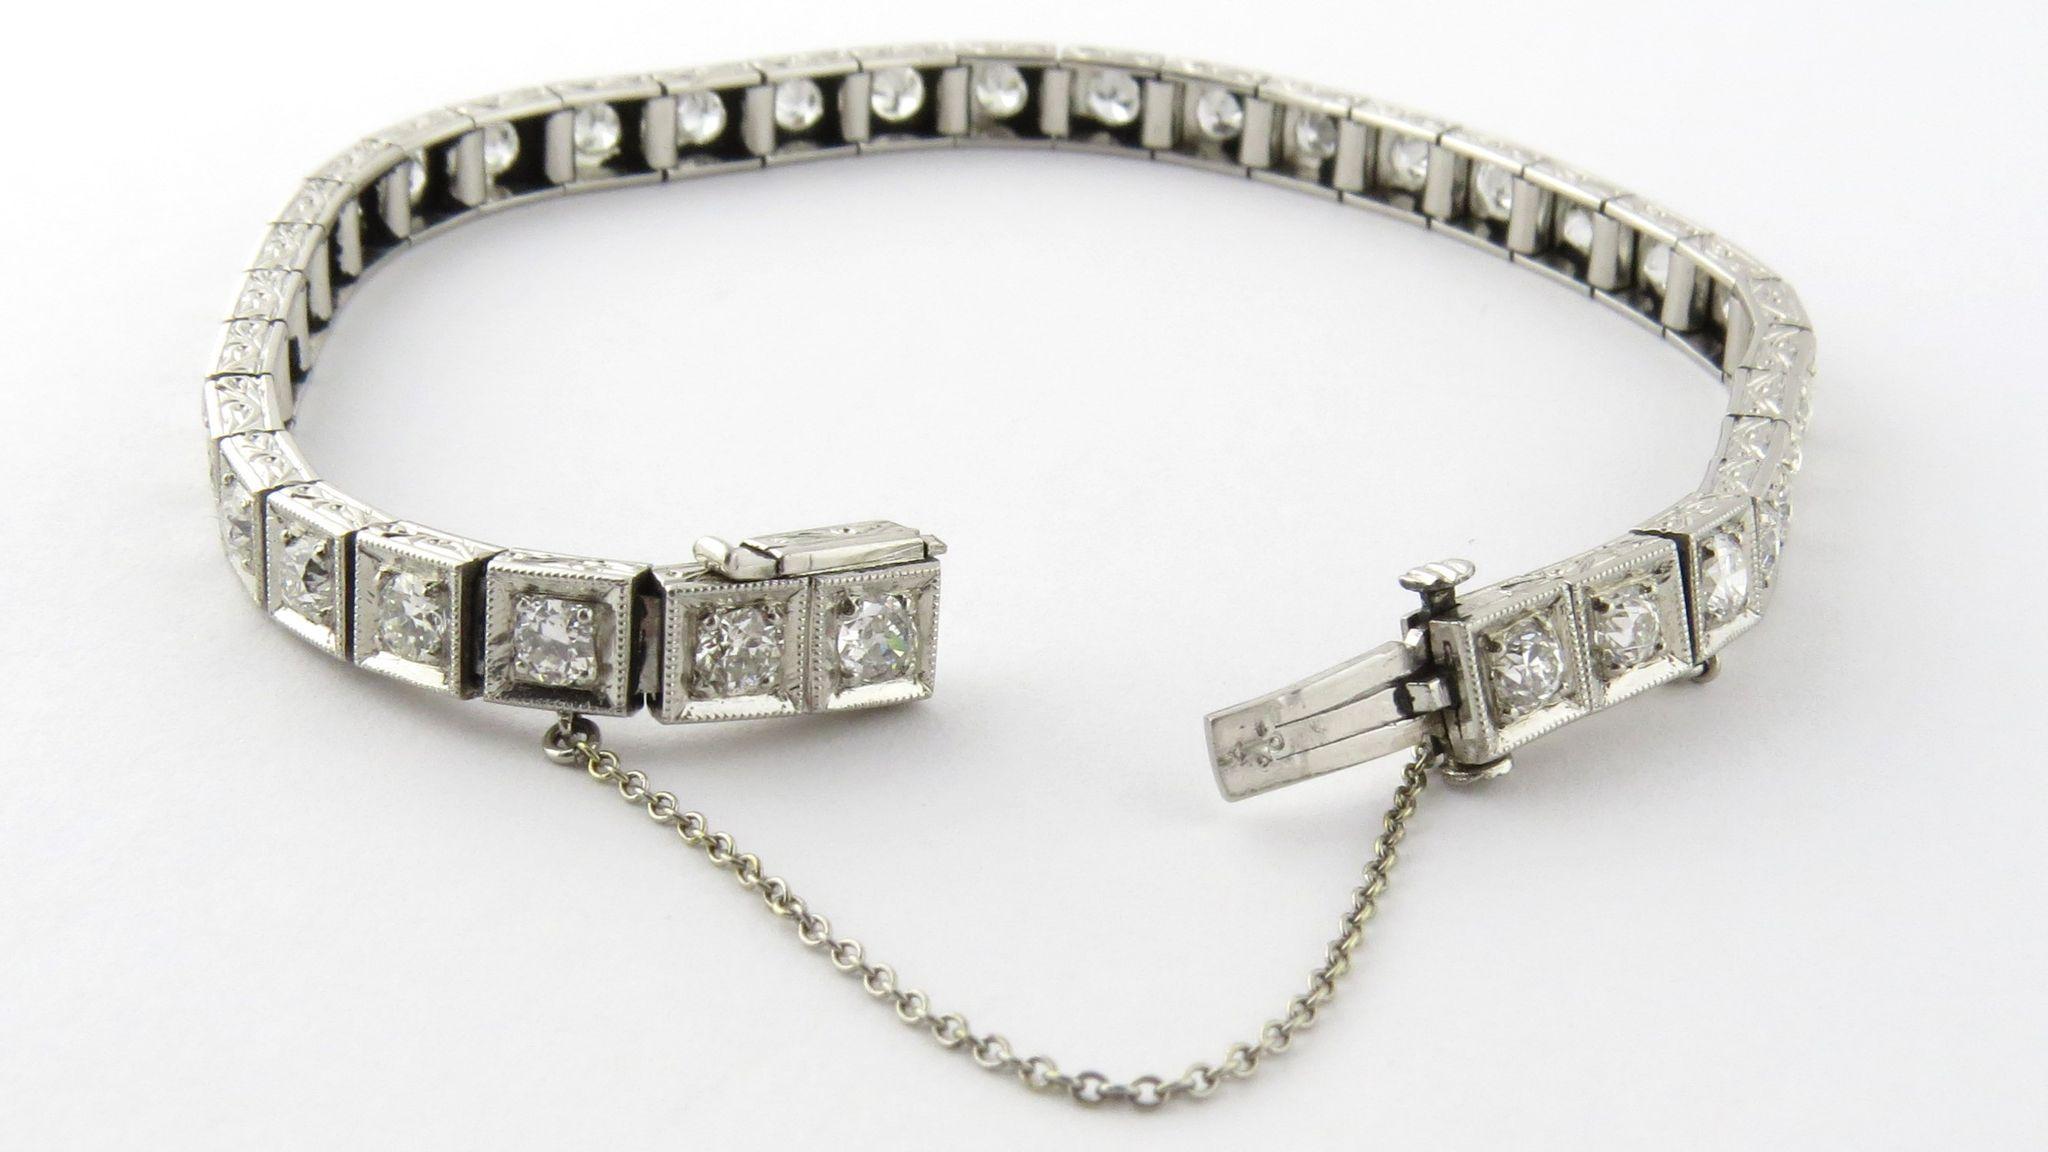 Antique Platinum And Diamond Tennis Bracelet Old Miner 4 2